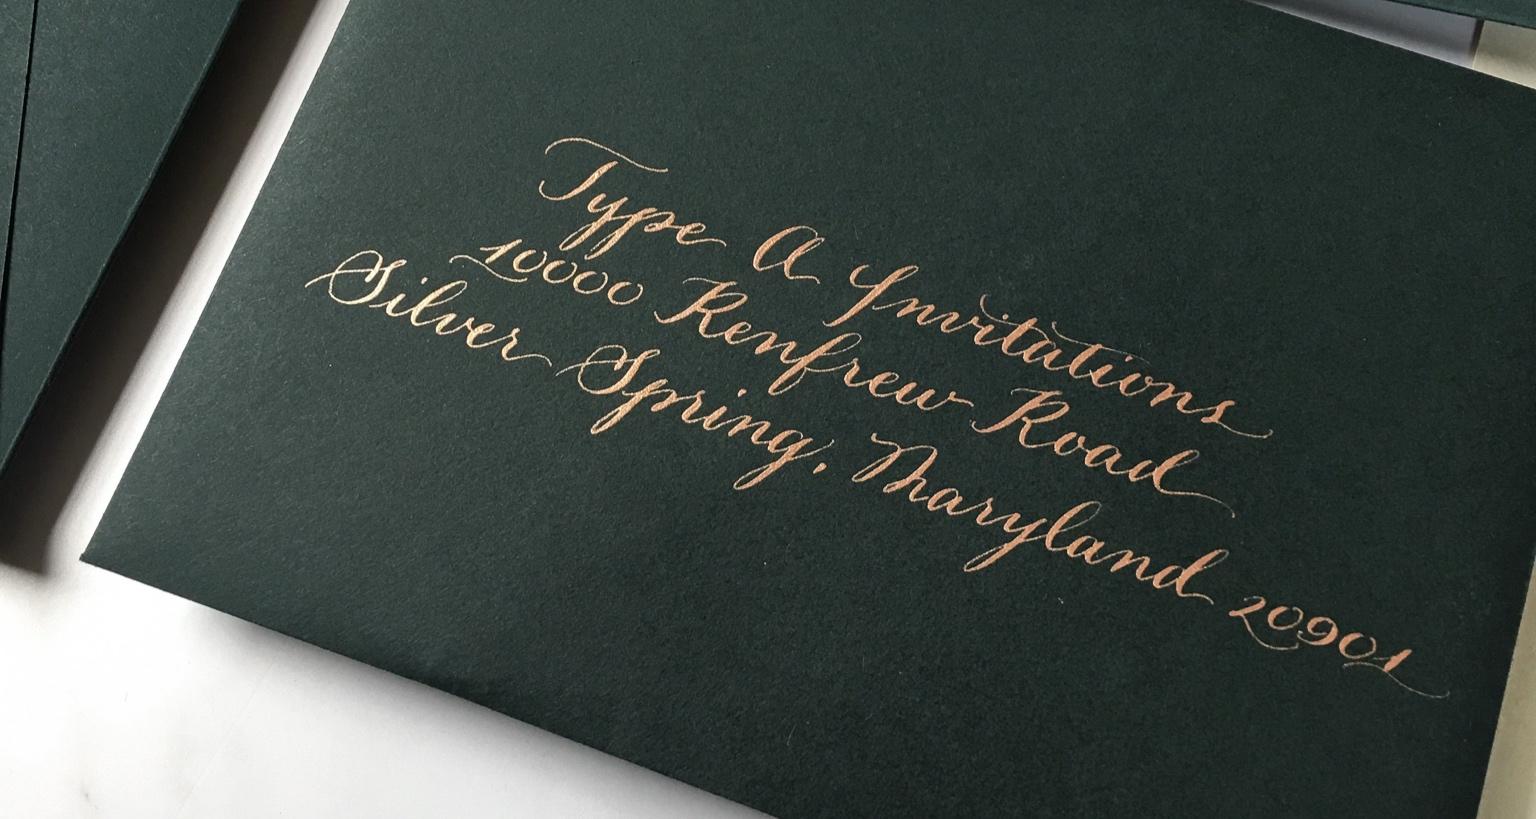 Each envelope was hand written with copper metallic ink by Emily van der Linde.